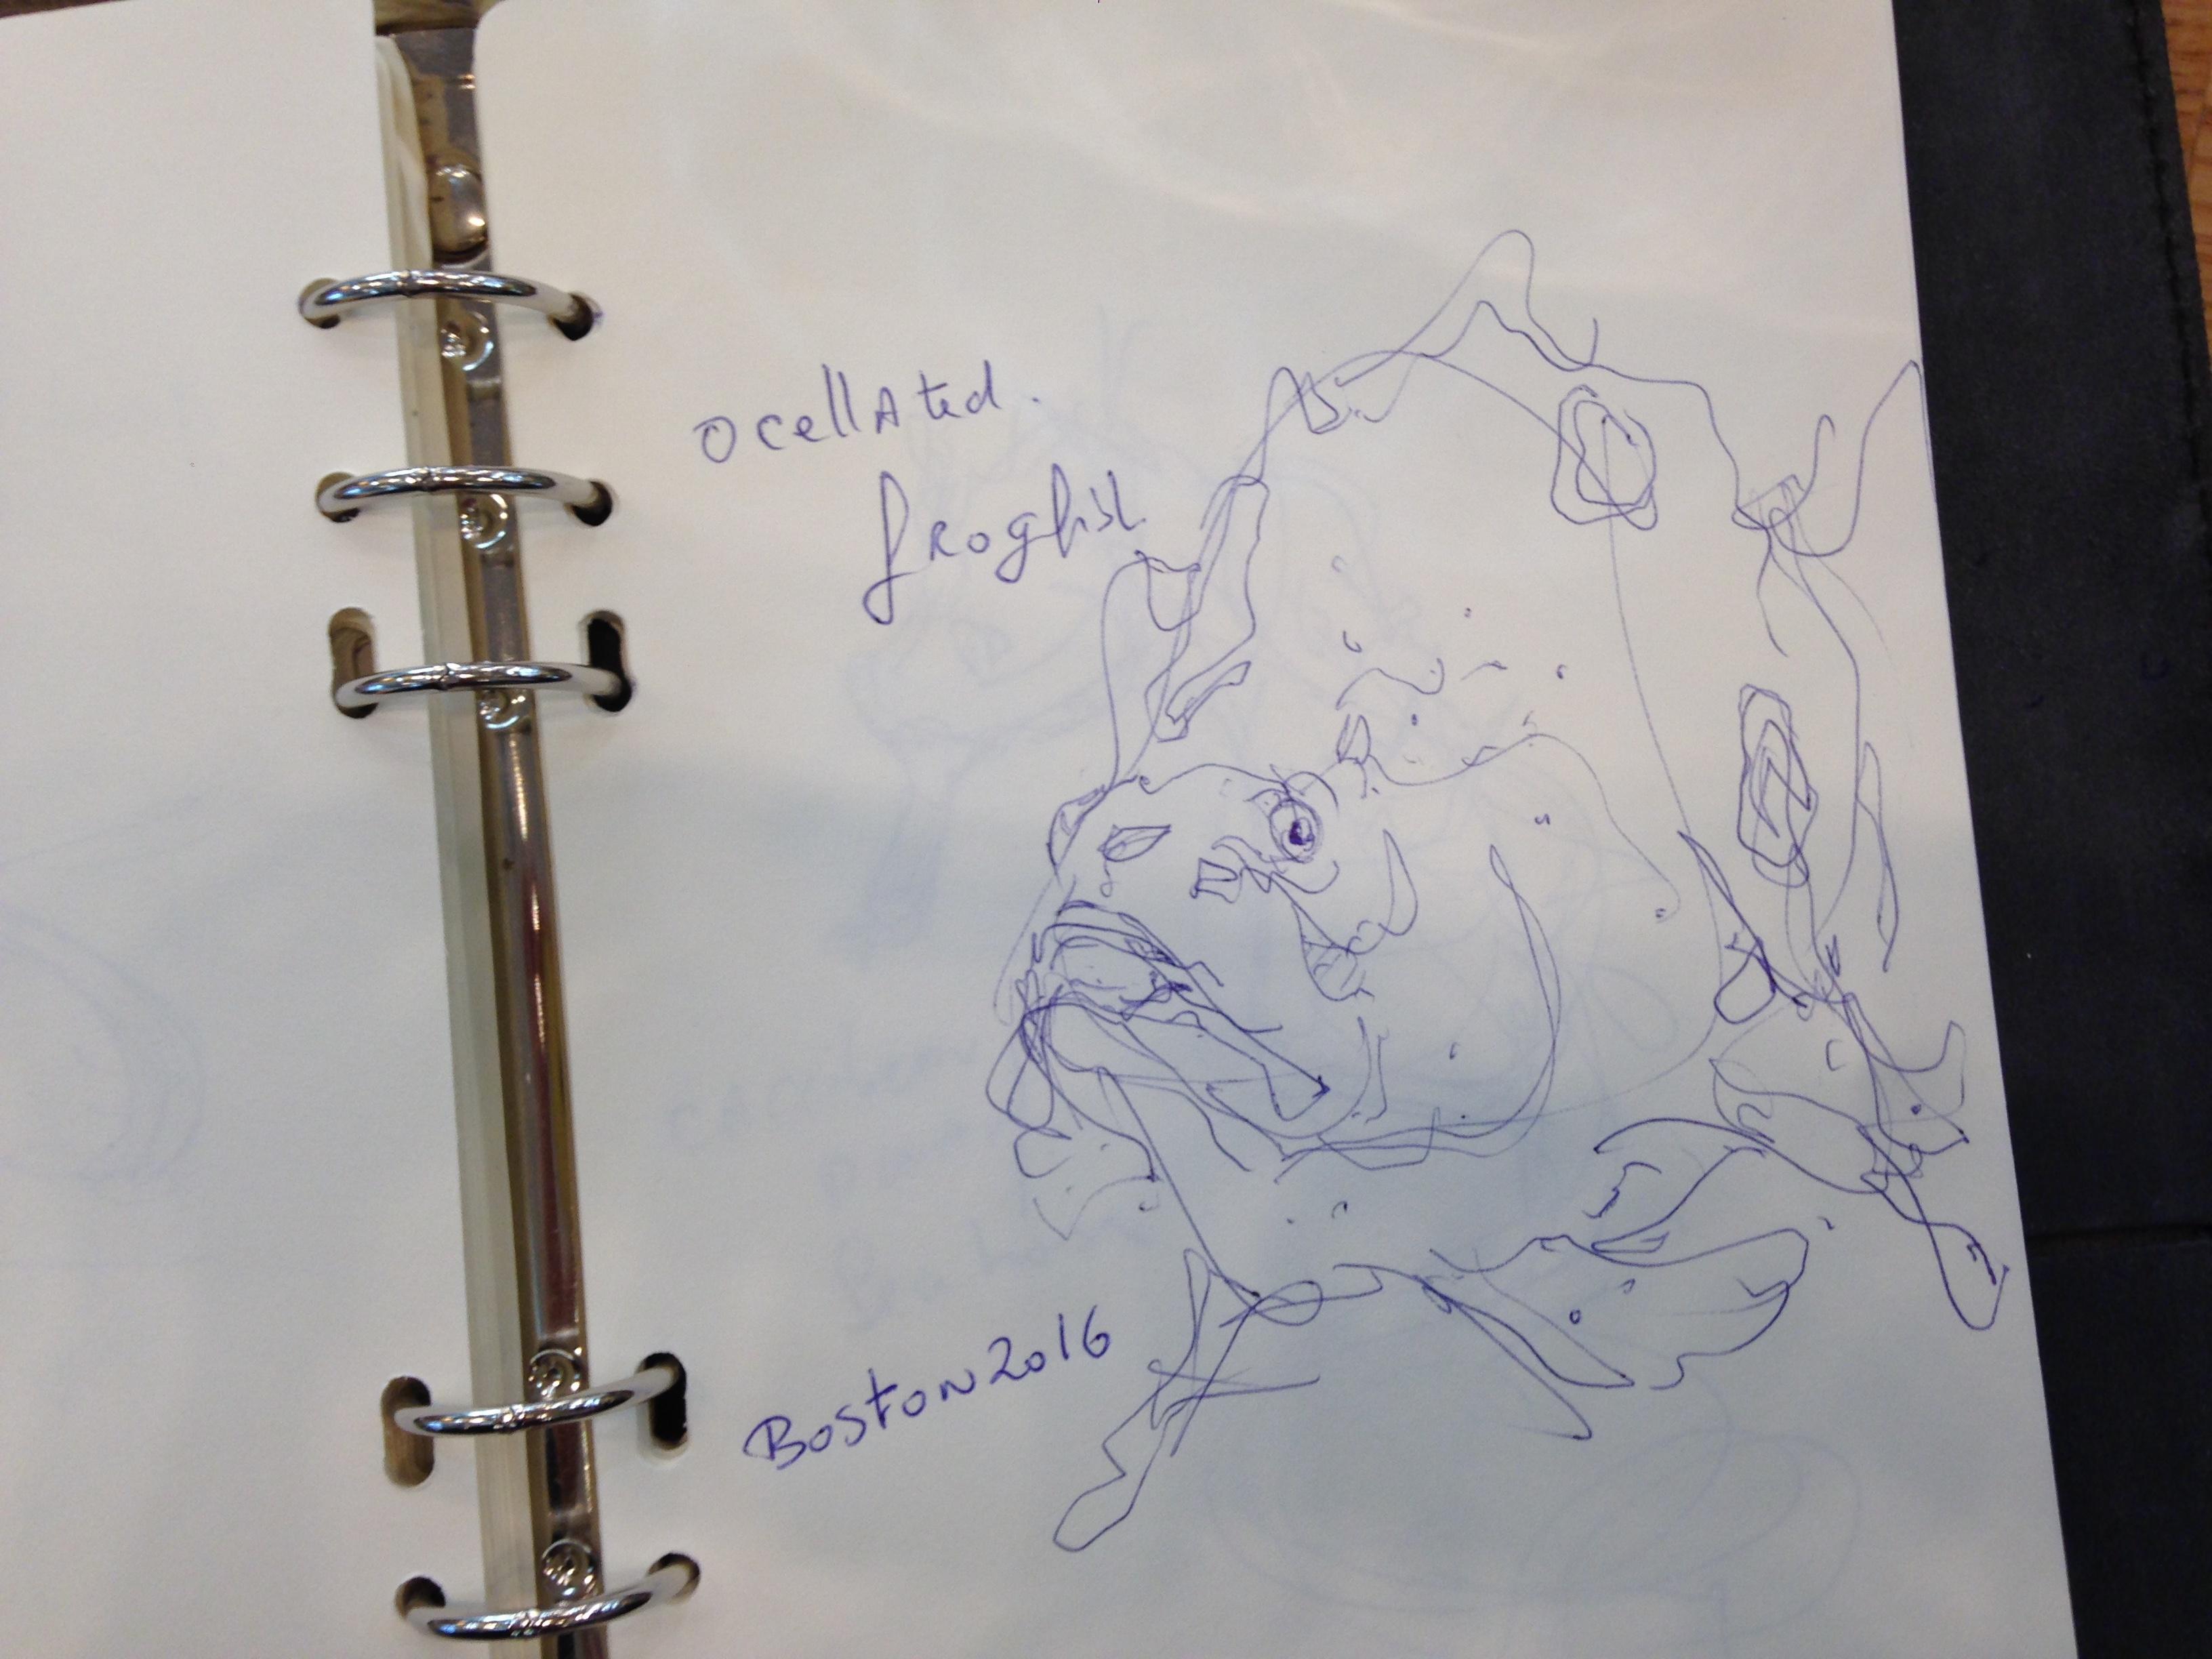 the design sketchbook sketch boston acquarium fish drawing ball point pen blue bic a